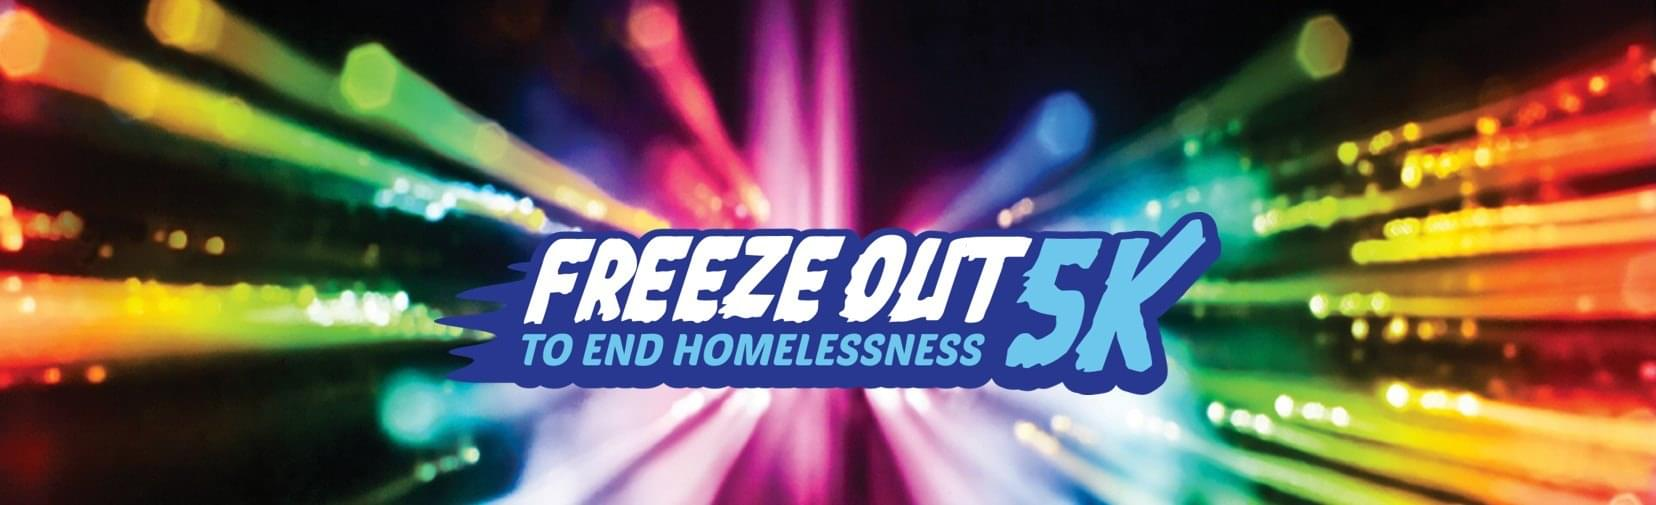 Syracuse Freeze Out 5K 2020 | February 21st